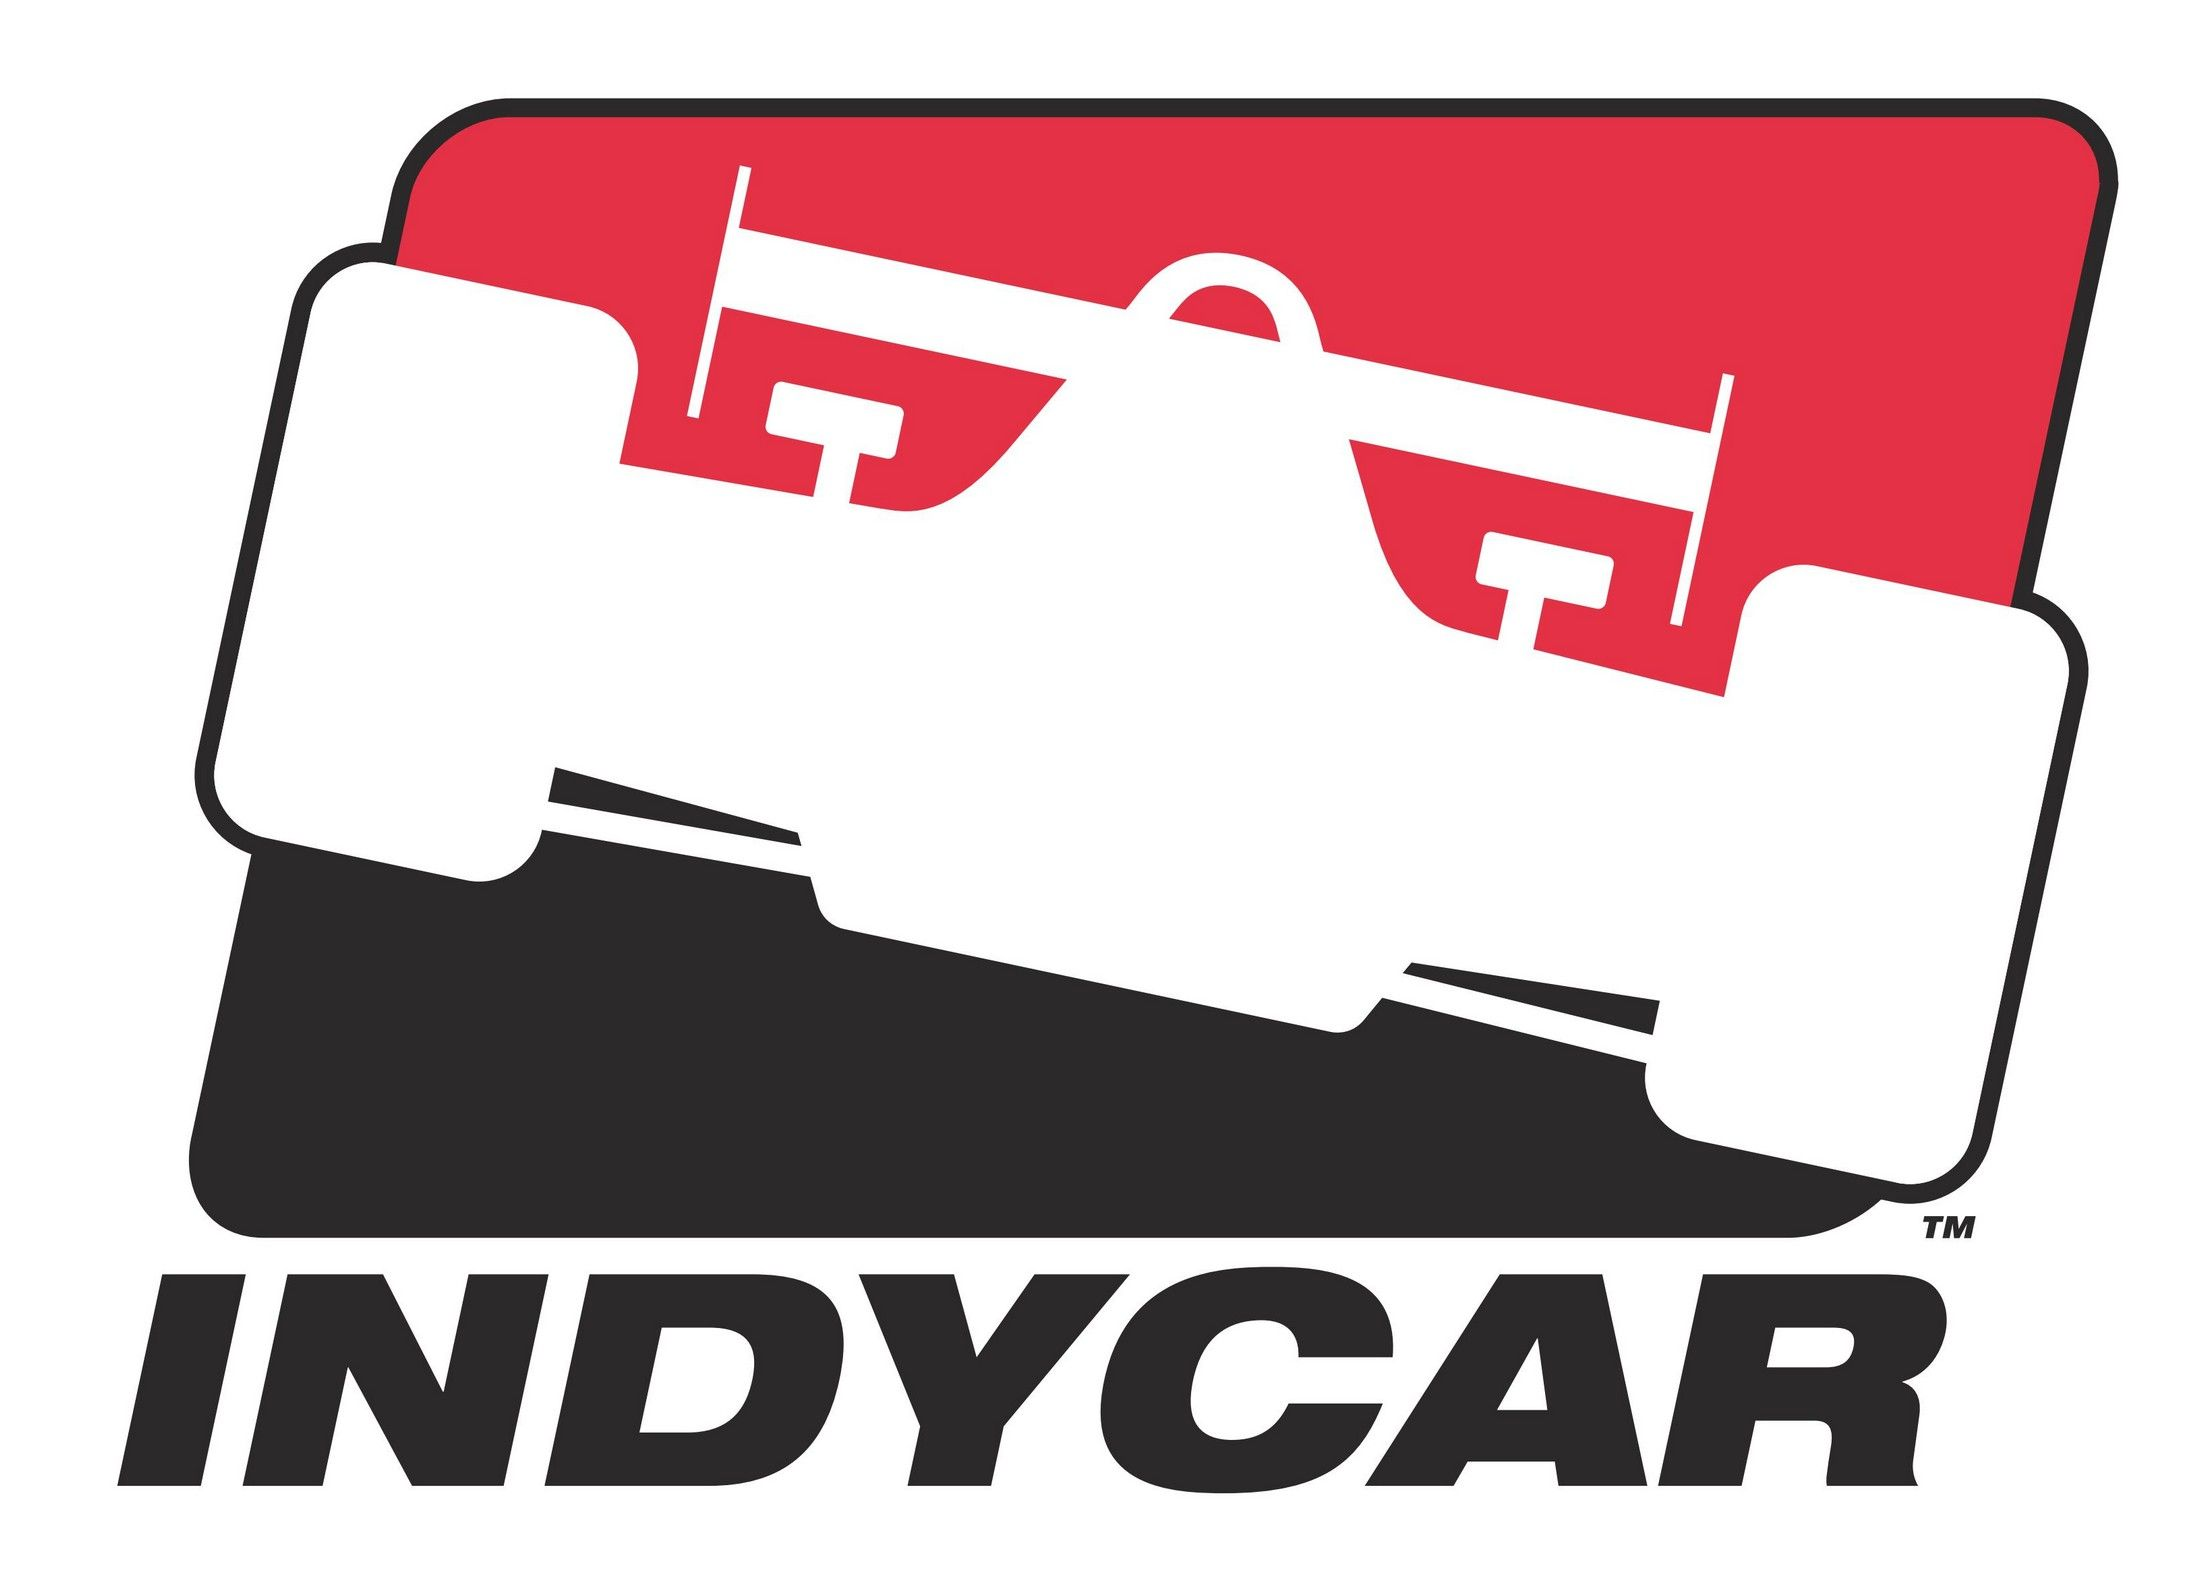 Car body sticker design eps - Indycar Logo Eps File Auto Racing Auto Sport Motor Car